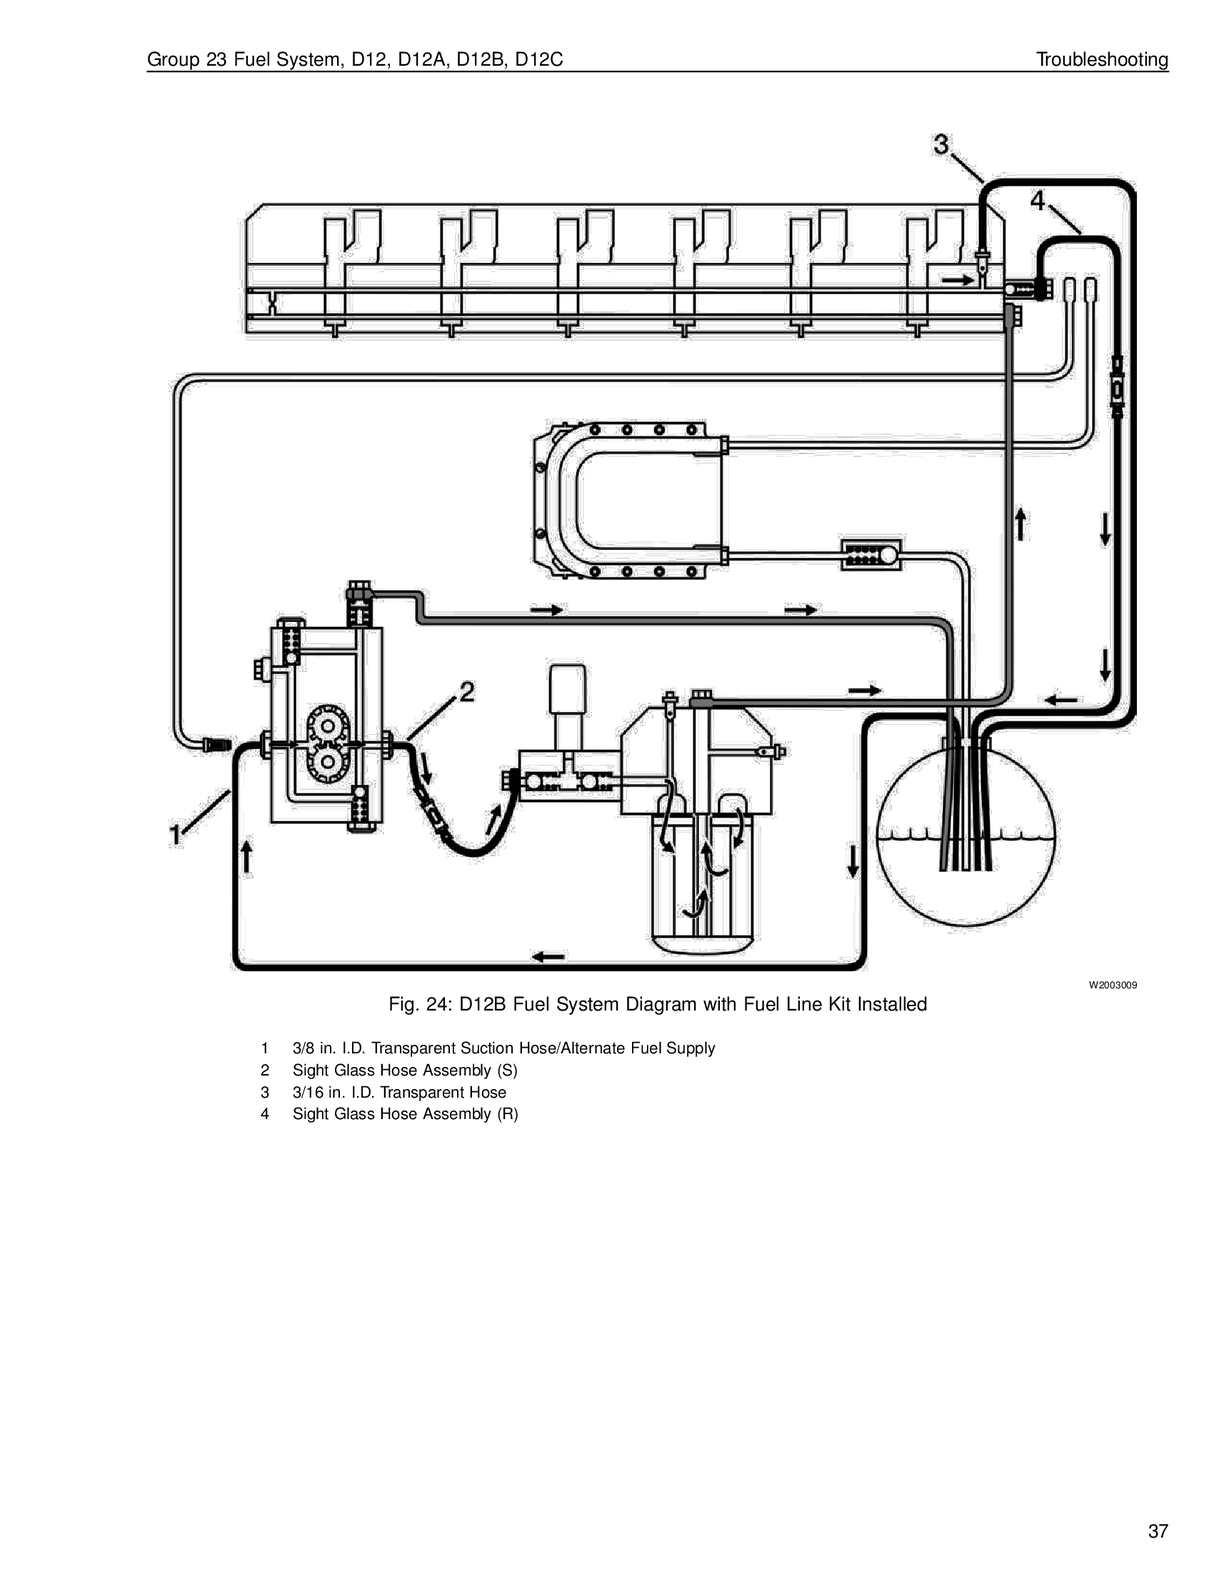 general fuel pump diagram wiring diagram mega general fuel pressure diagram wiring diagram mega general fuel pump diagram